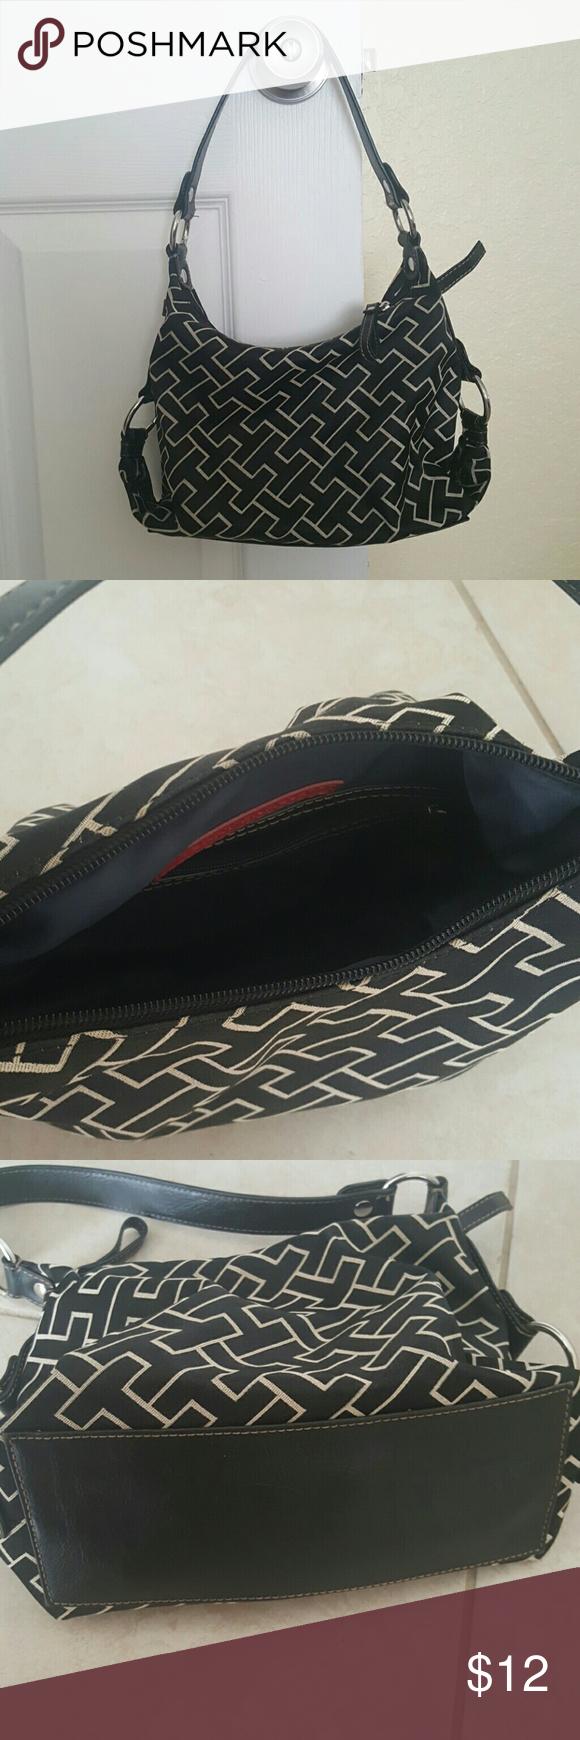 Authentic Tommy Hilfiger purse Excellent condition textile purse.  Make offers!!!! Bundle and save!!! Tommy Hilfiger Bags